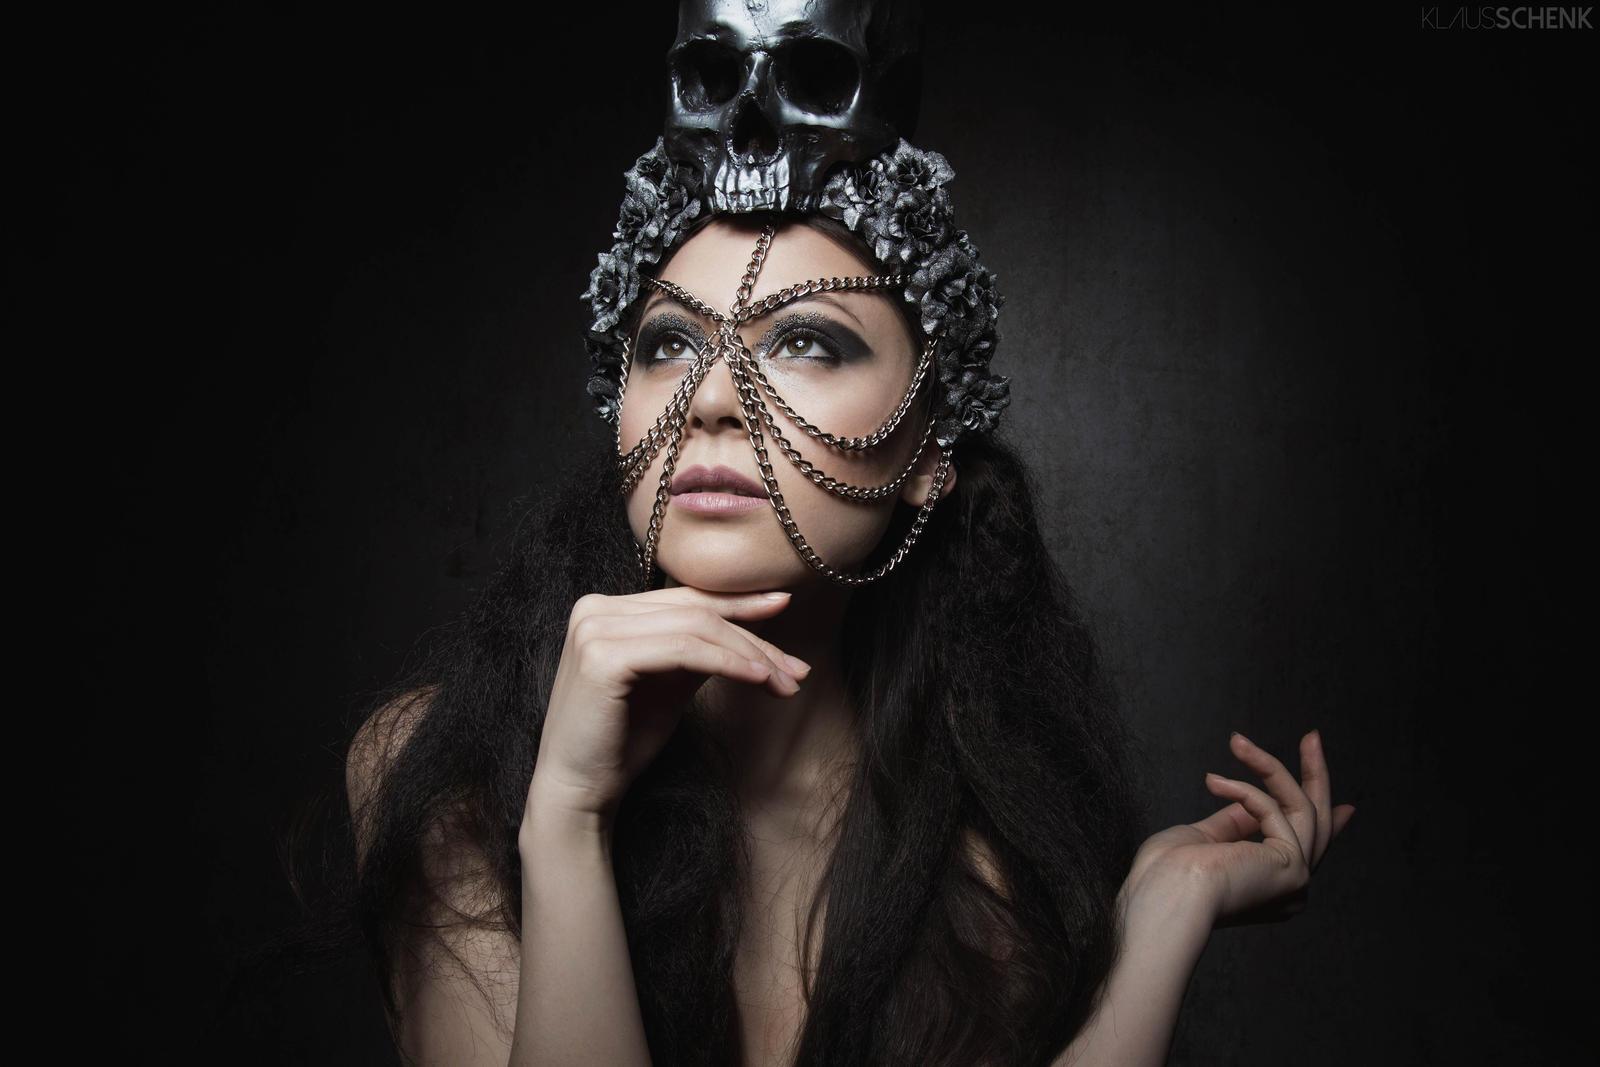 Dark Beauty by kschenk